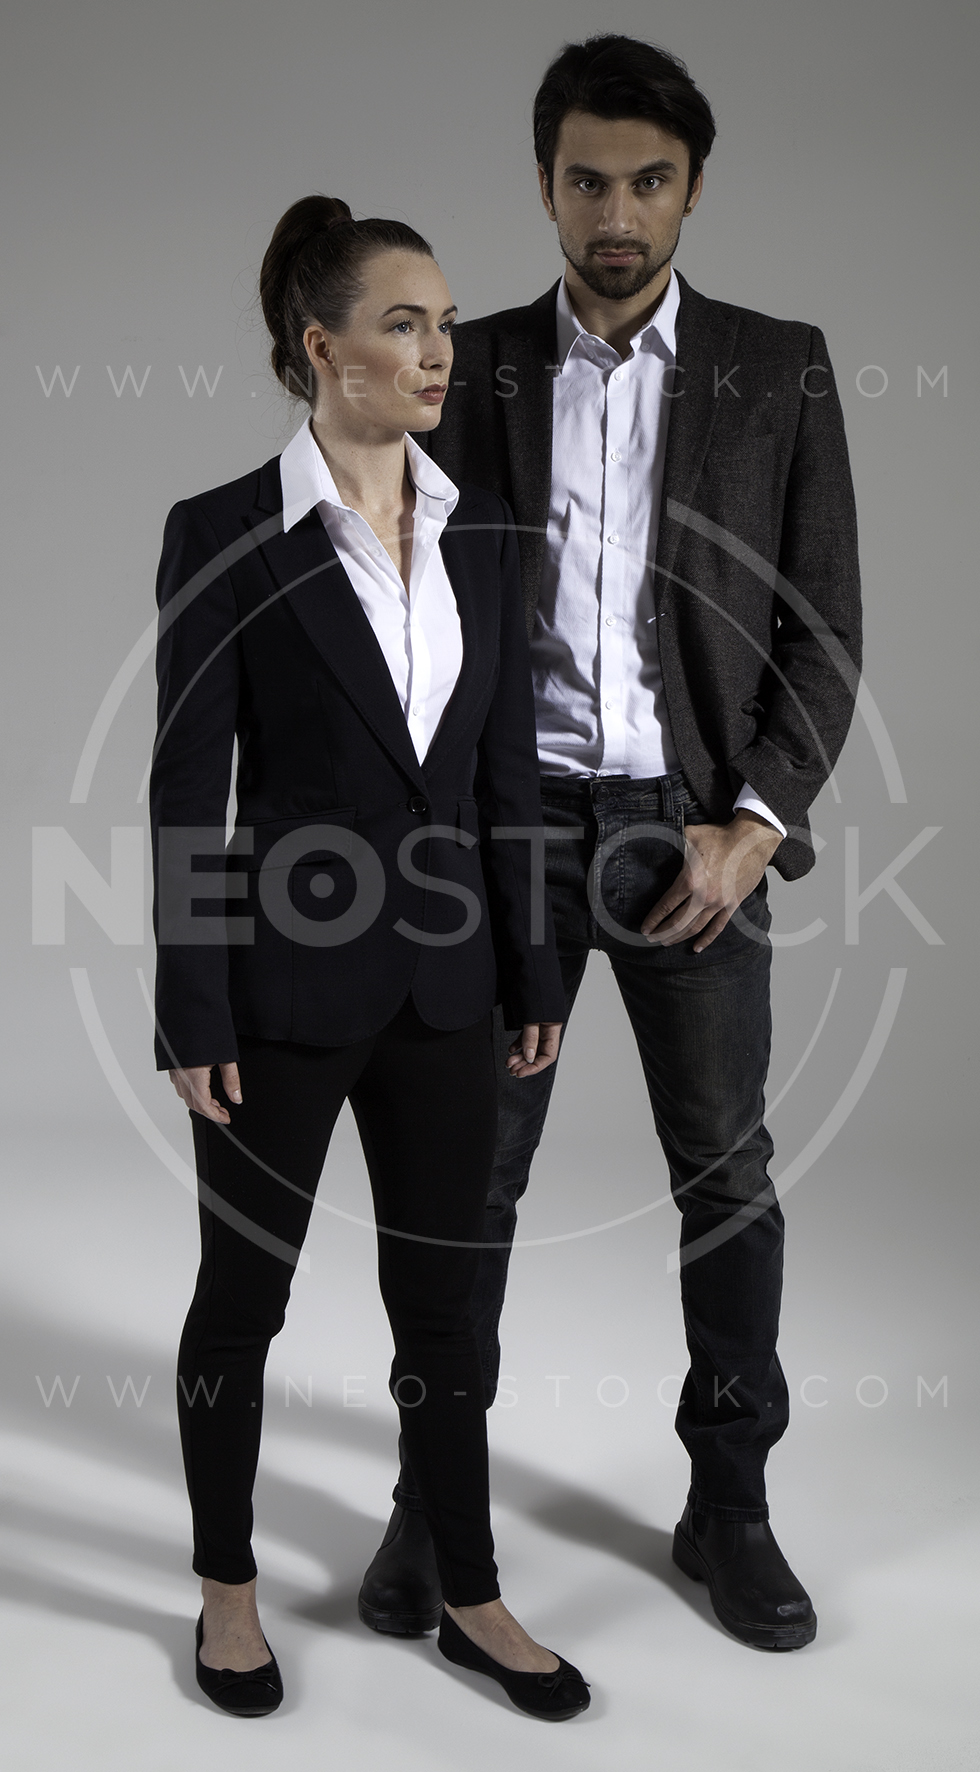 NeoStock - Cop Drama Duo - Stock Photography V